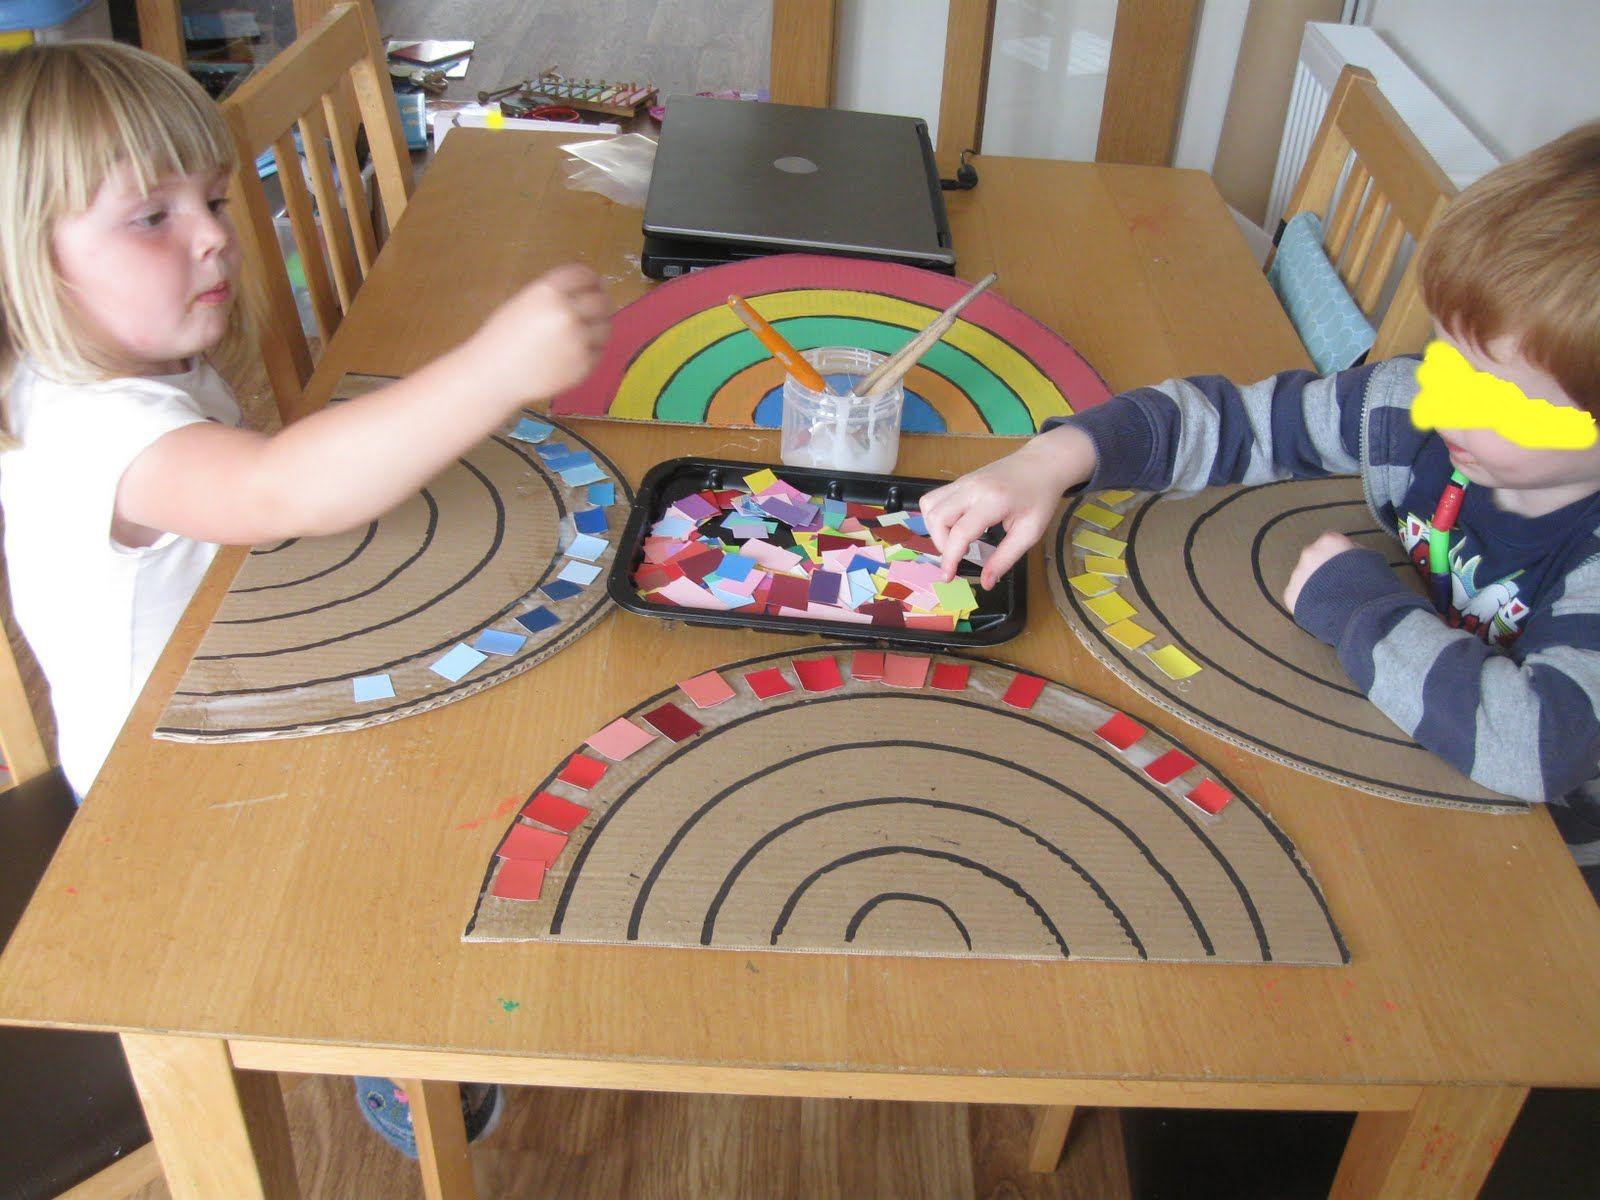 Rainbow Making With Preschoolers